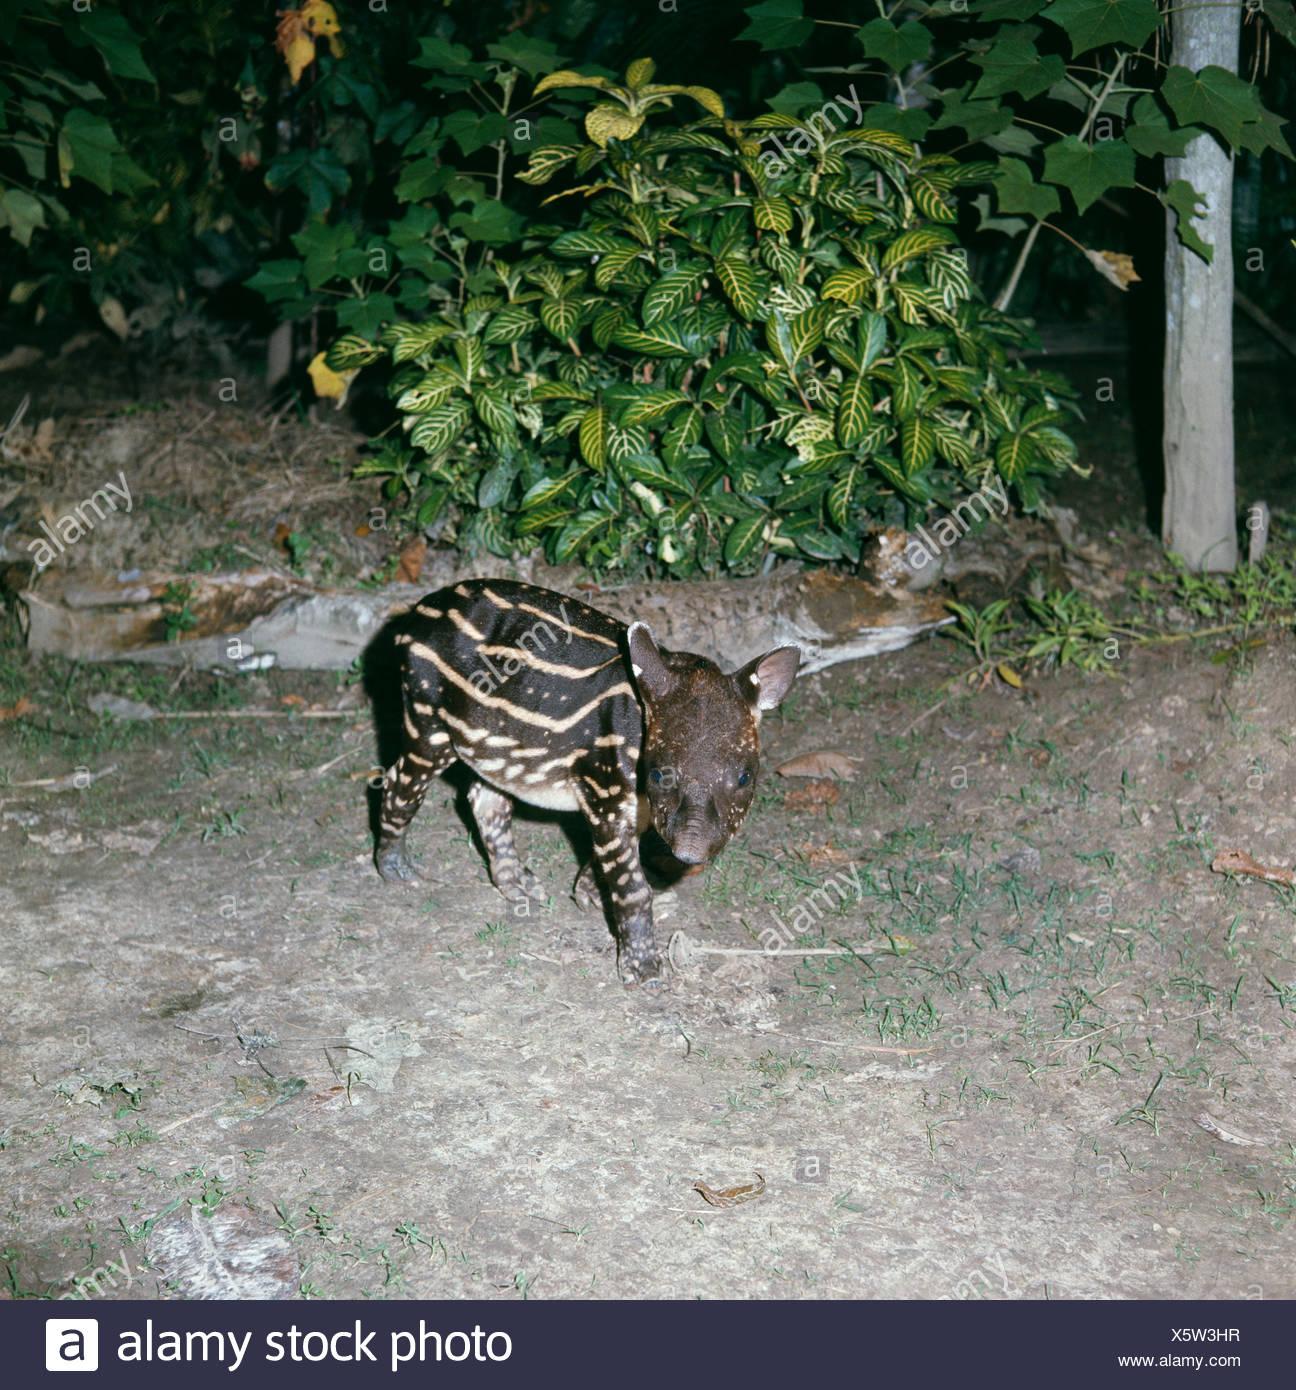 Amazon Tapirs Stock Photos & Amazon Tapirs Stock Images